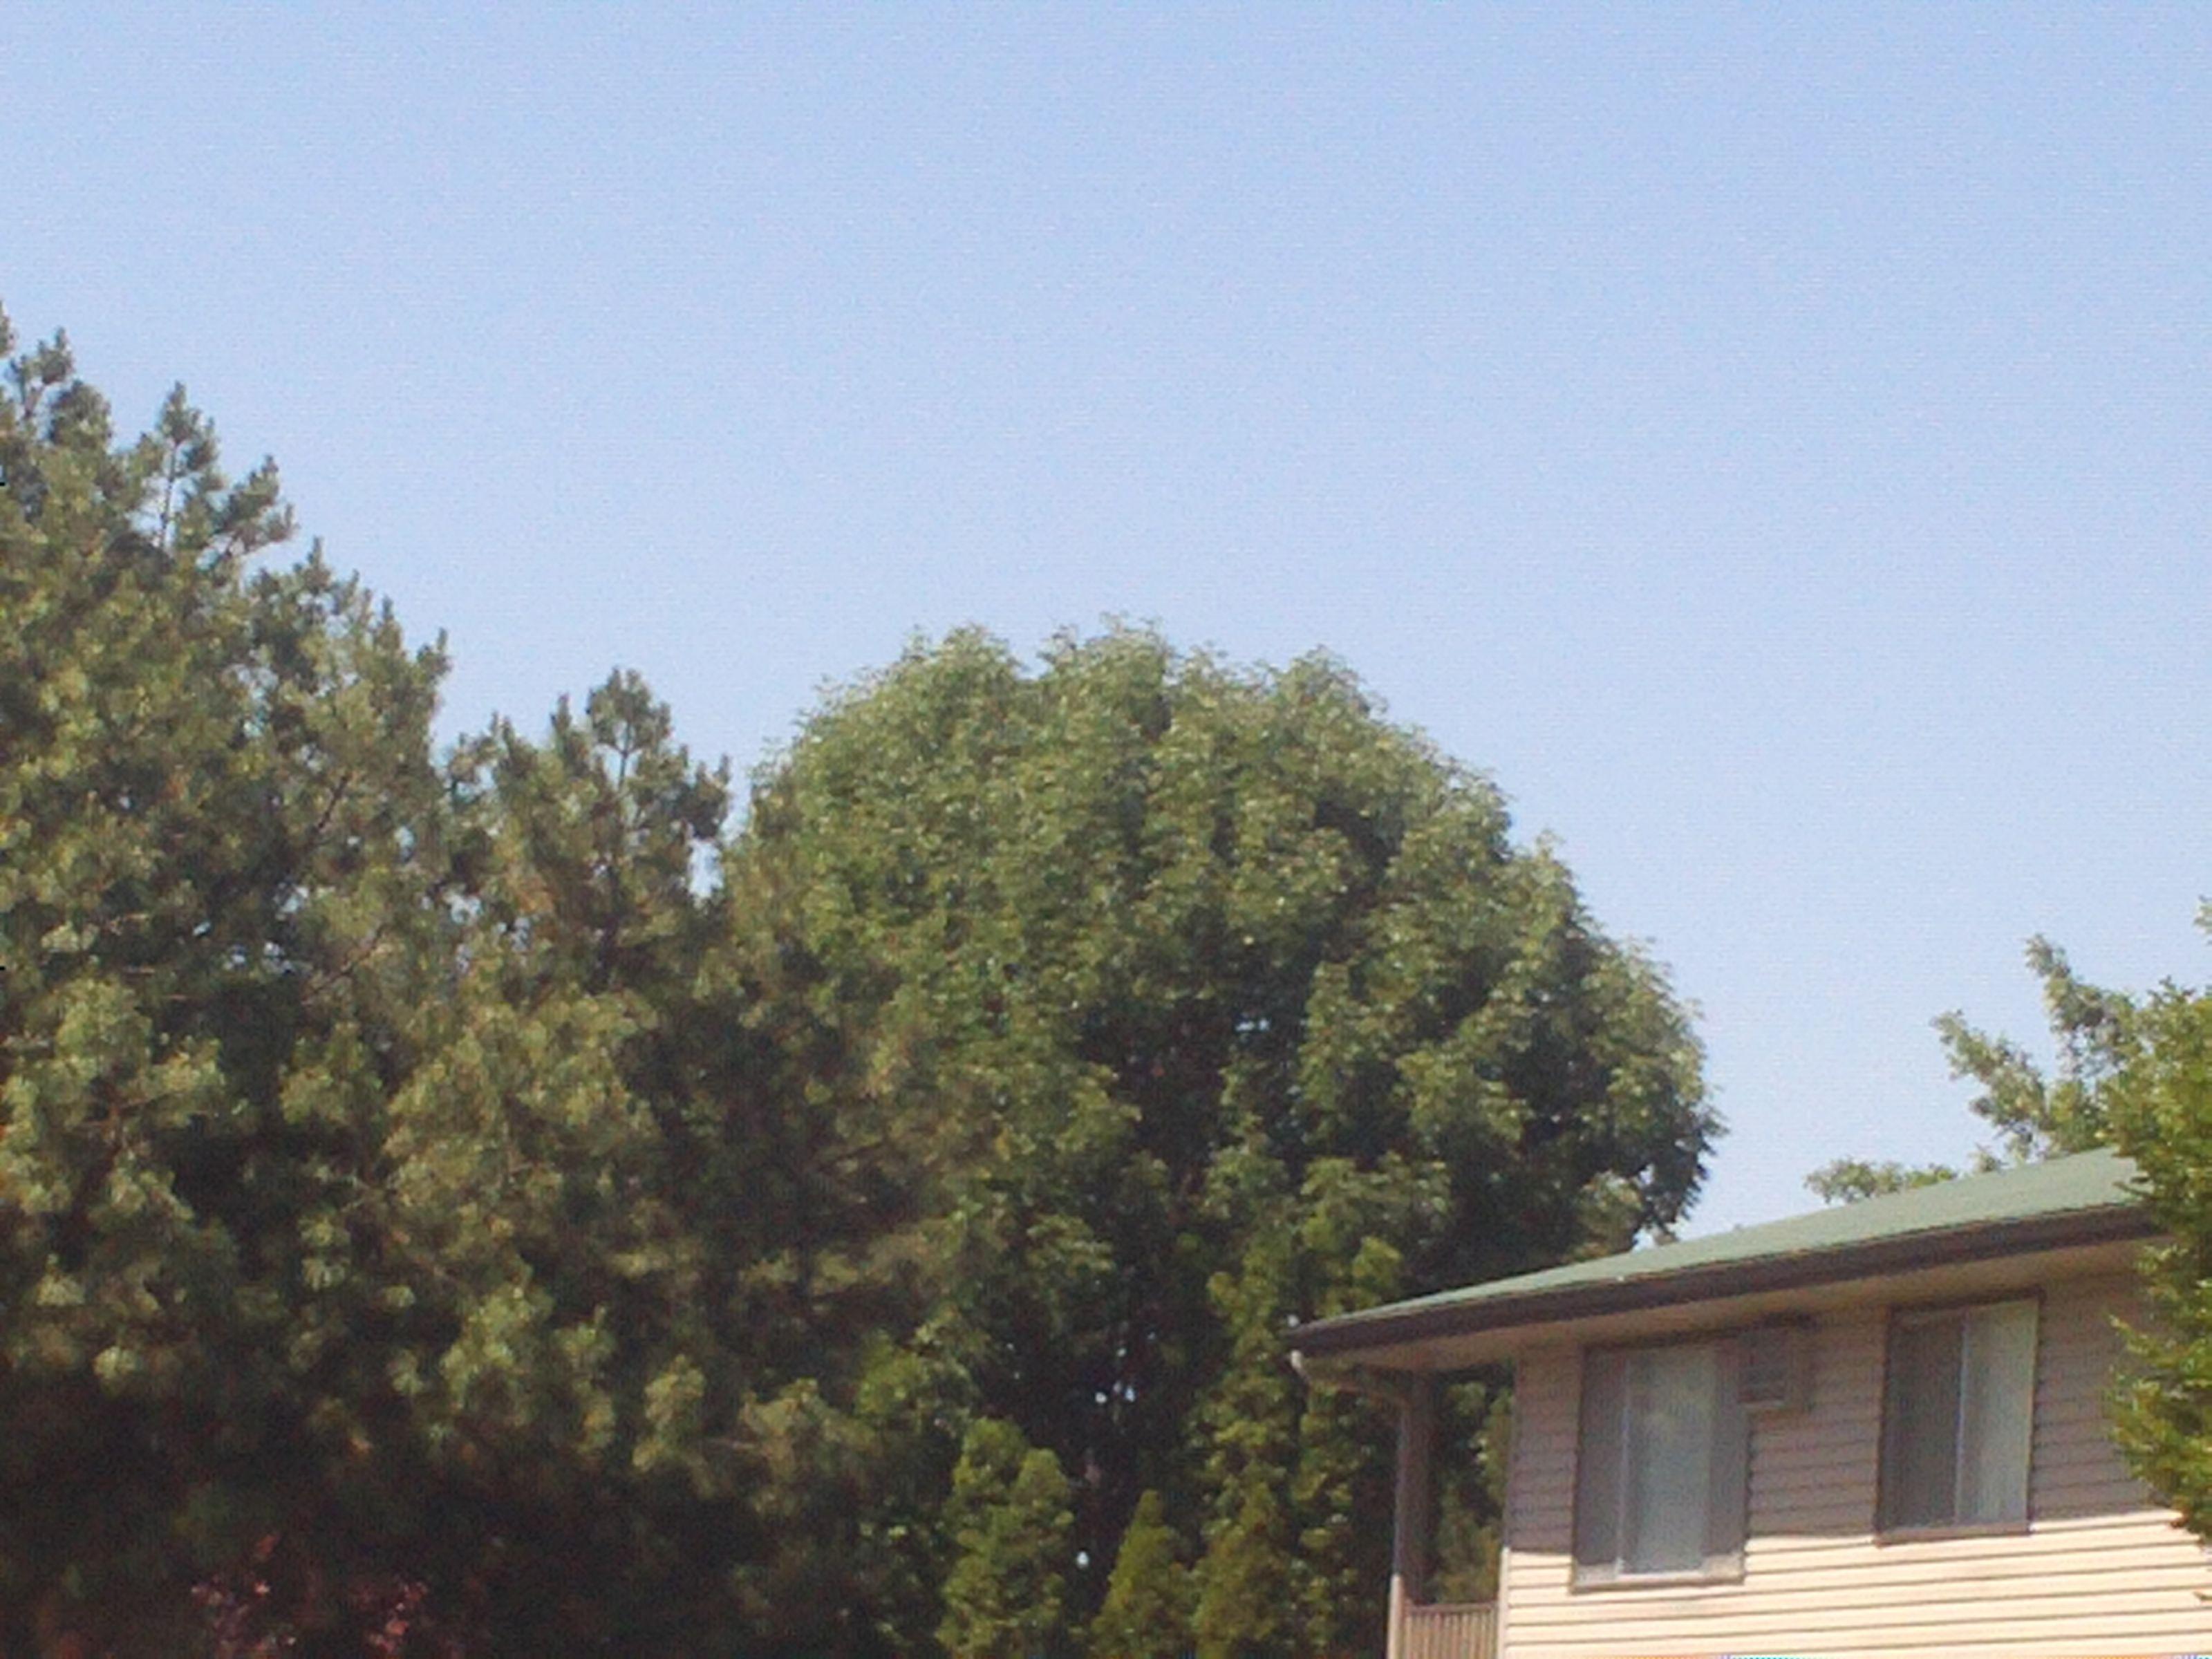 PT  JUNE 2014 TREES IN NAMPA IDAHO